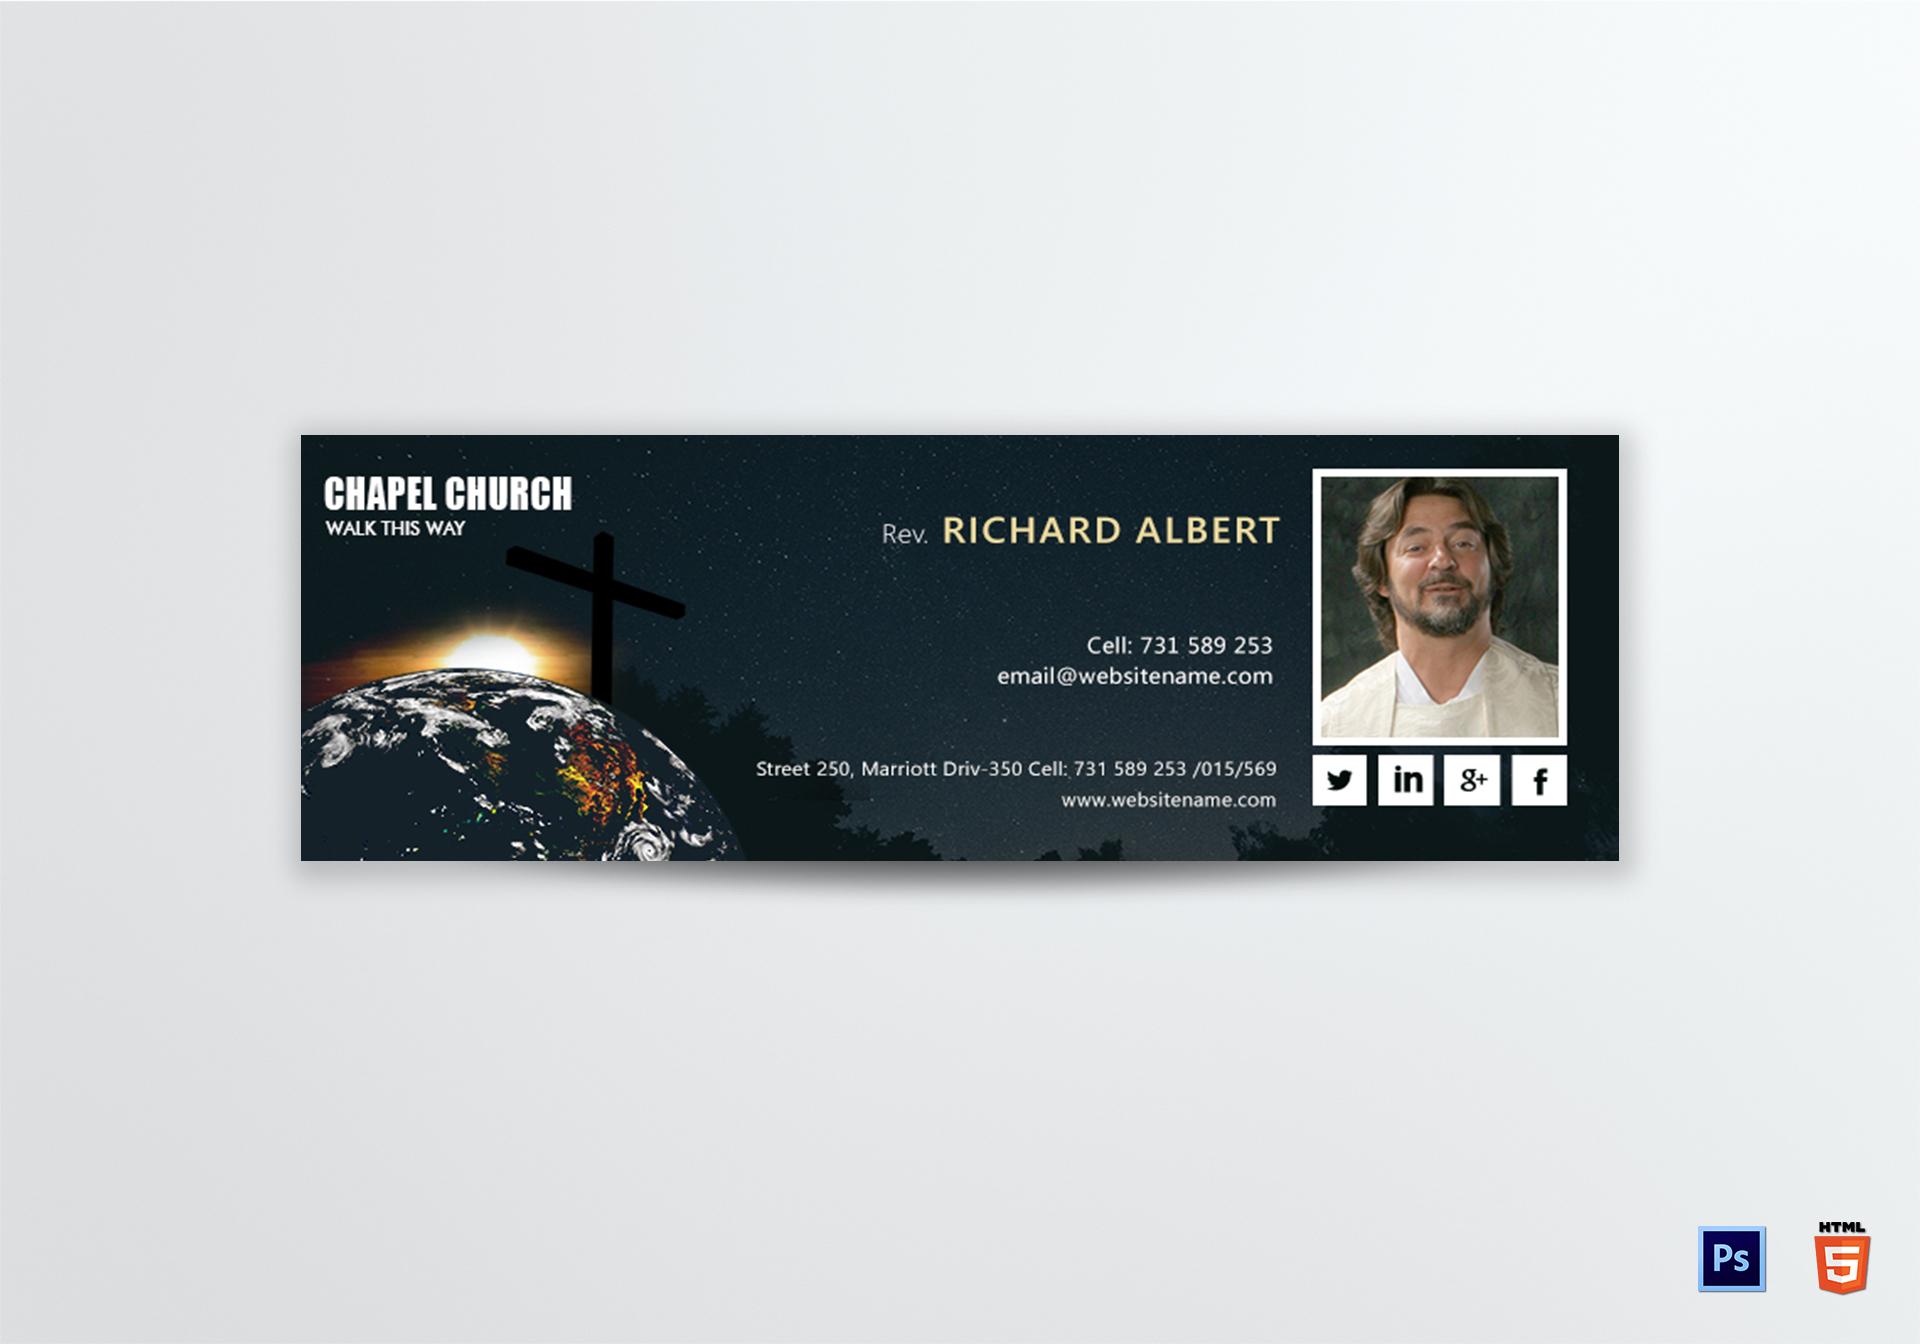 Church Email Signature